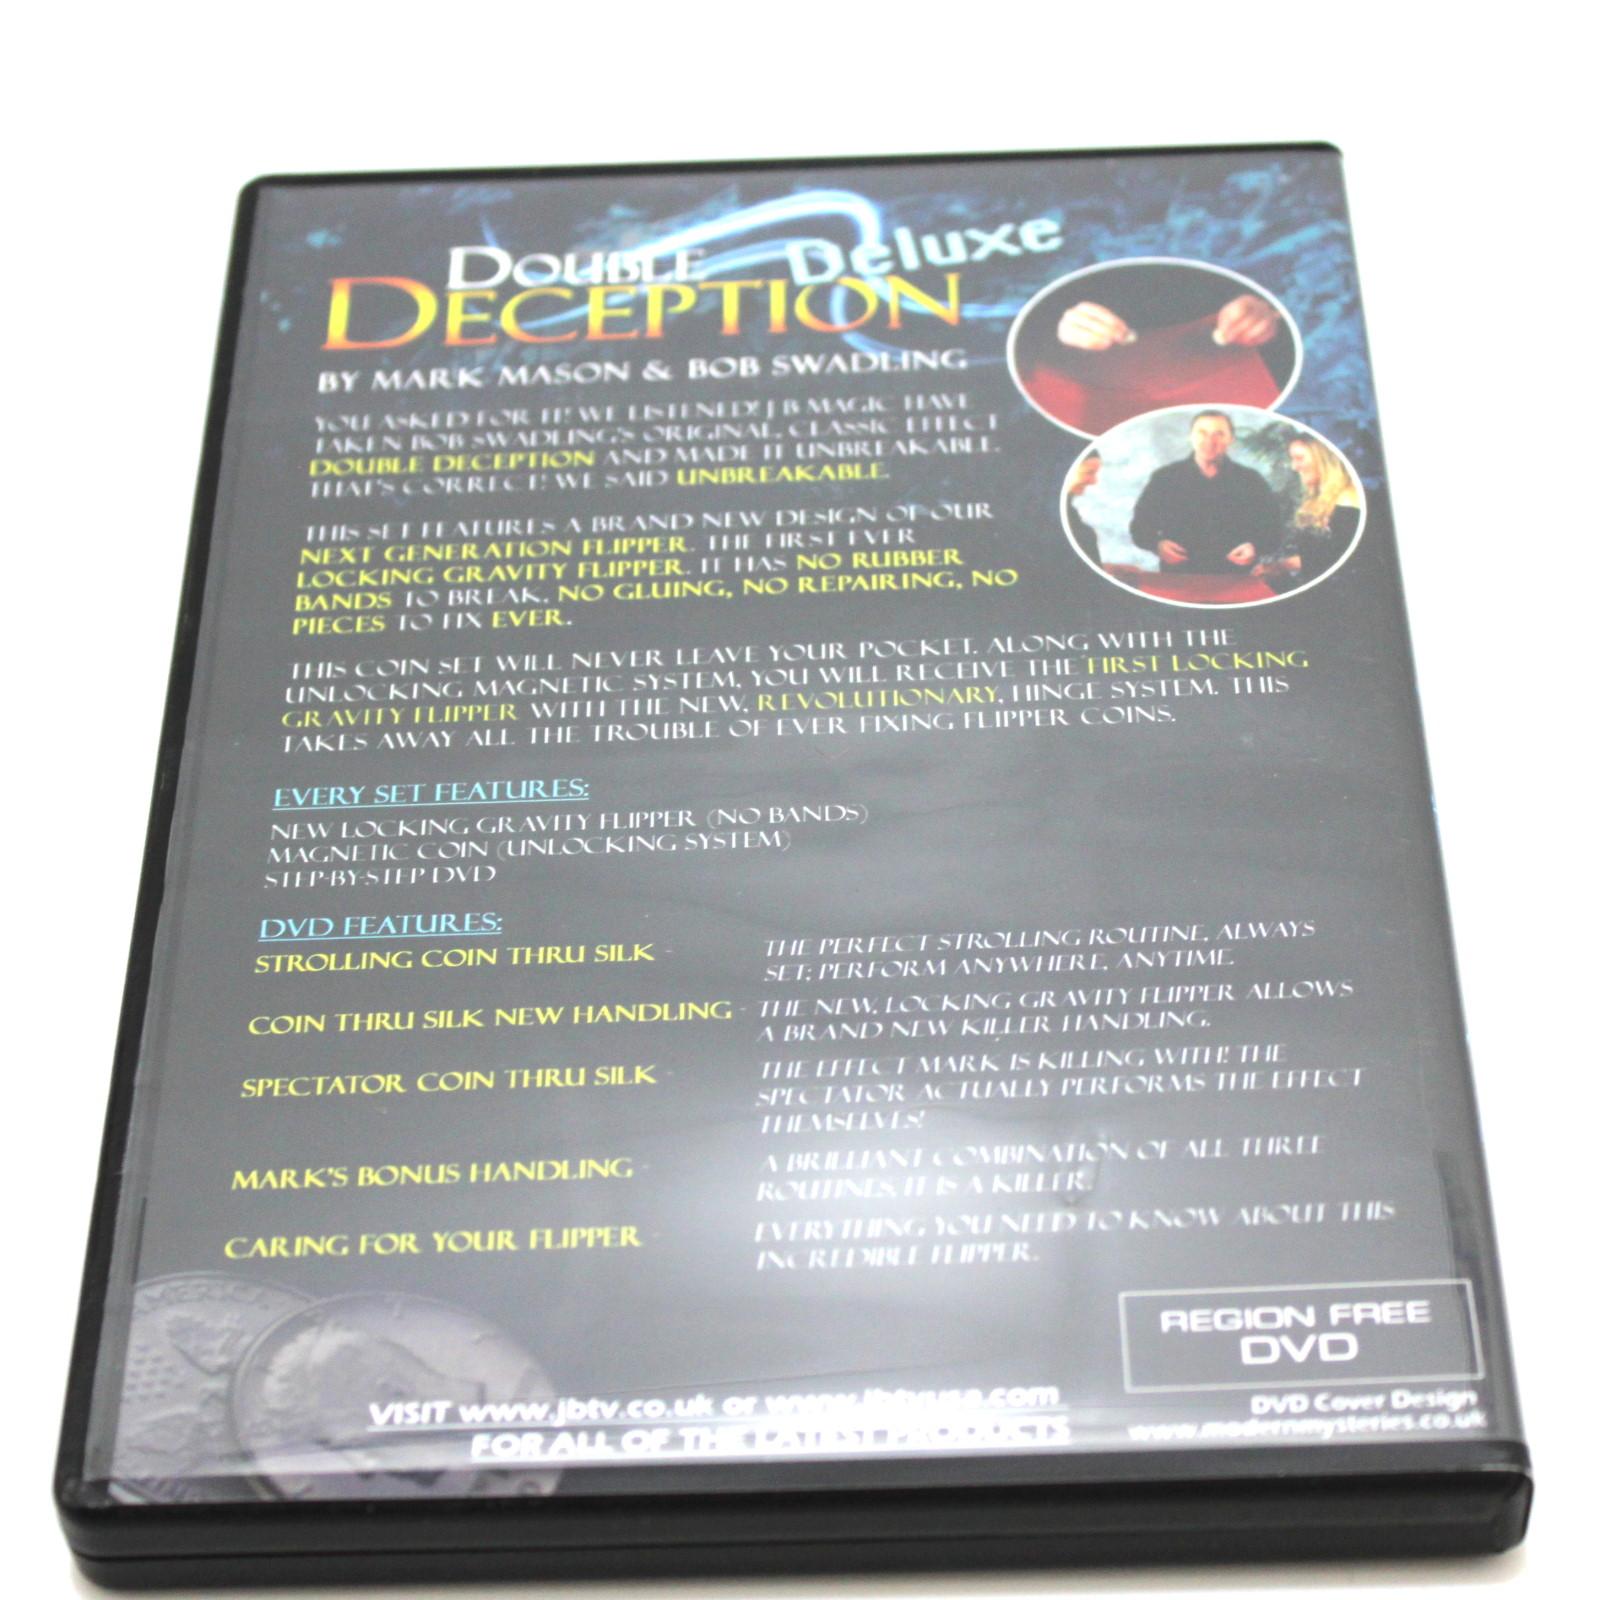 Double Deception Deluxe by Bob Swadling, Mark Mason